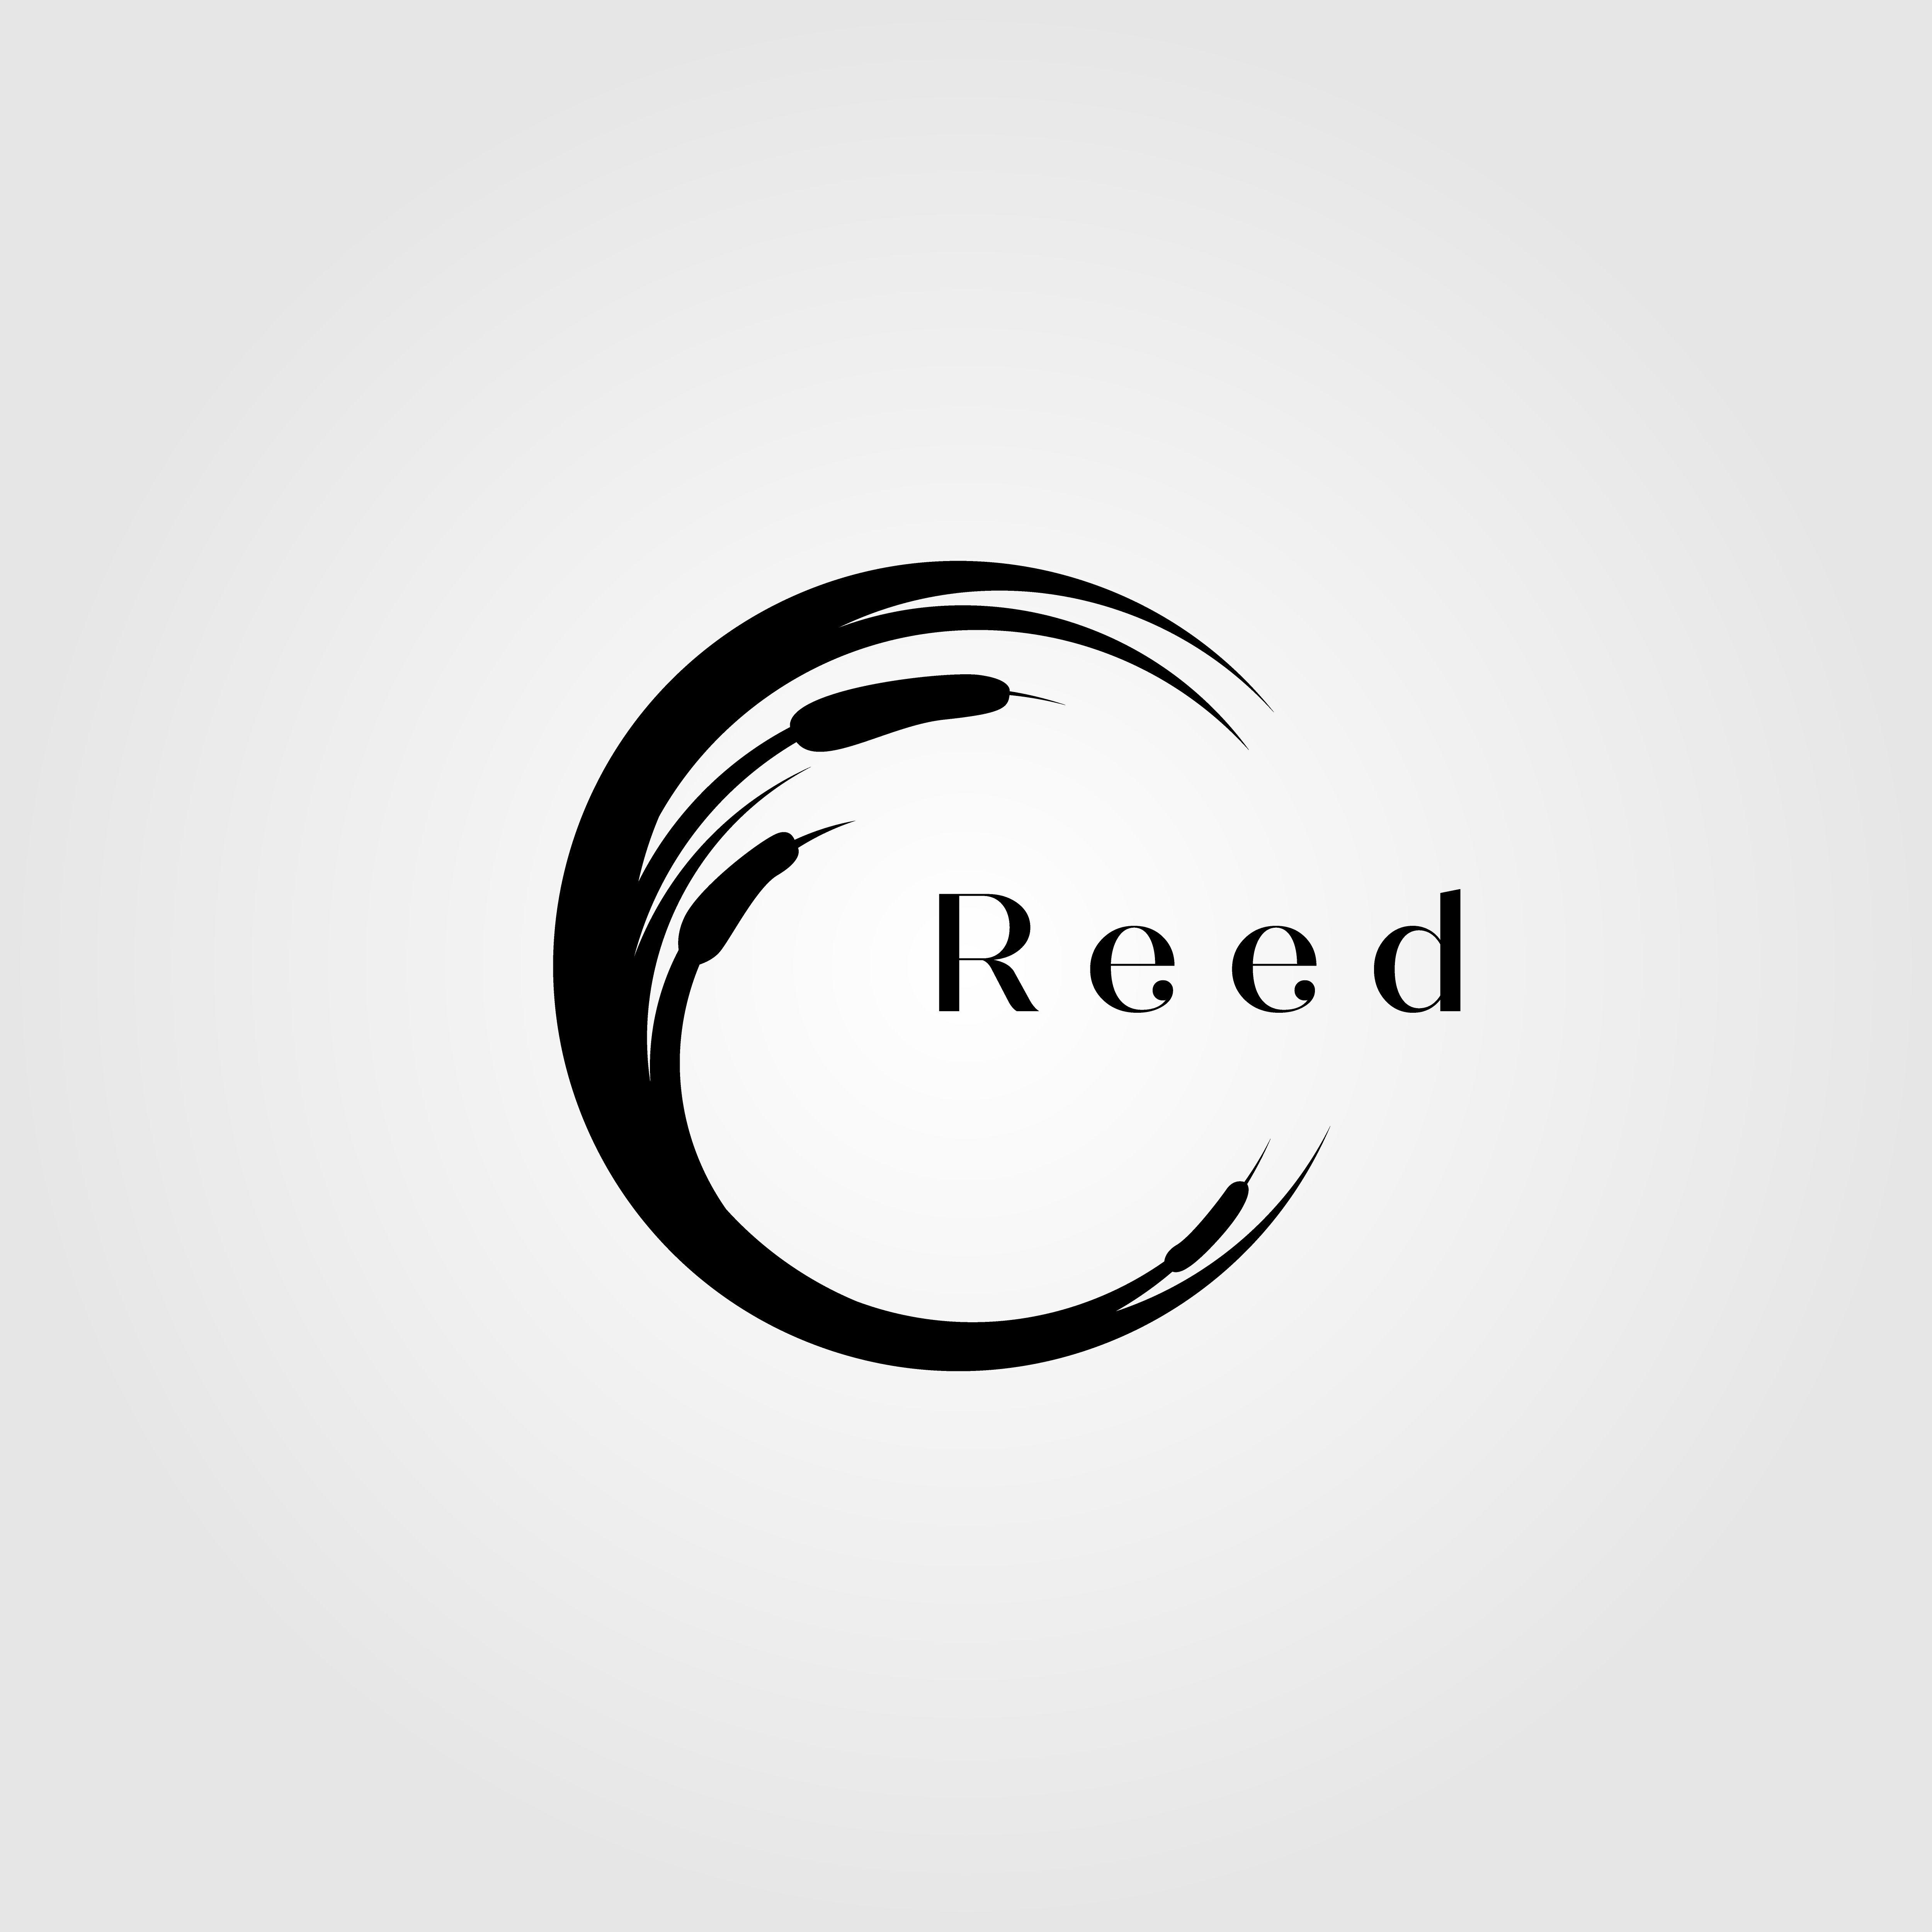 Reed, River, Grass, Letter , C, Logo, Vector, Illustration